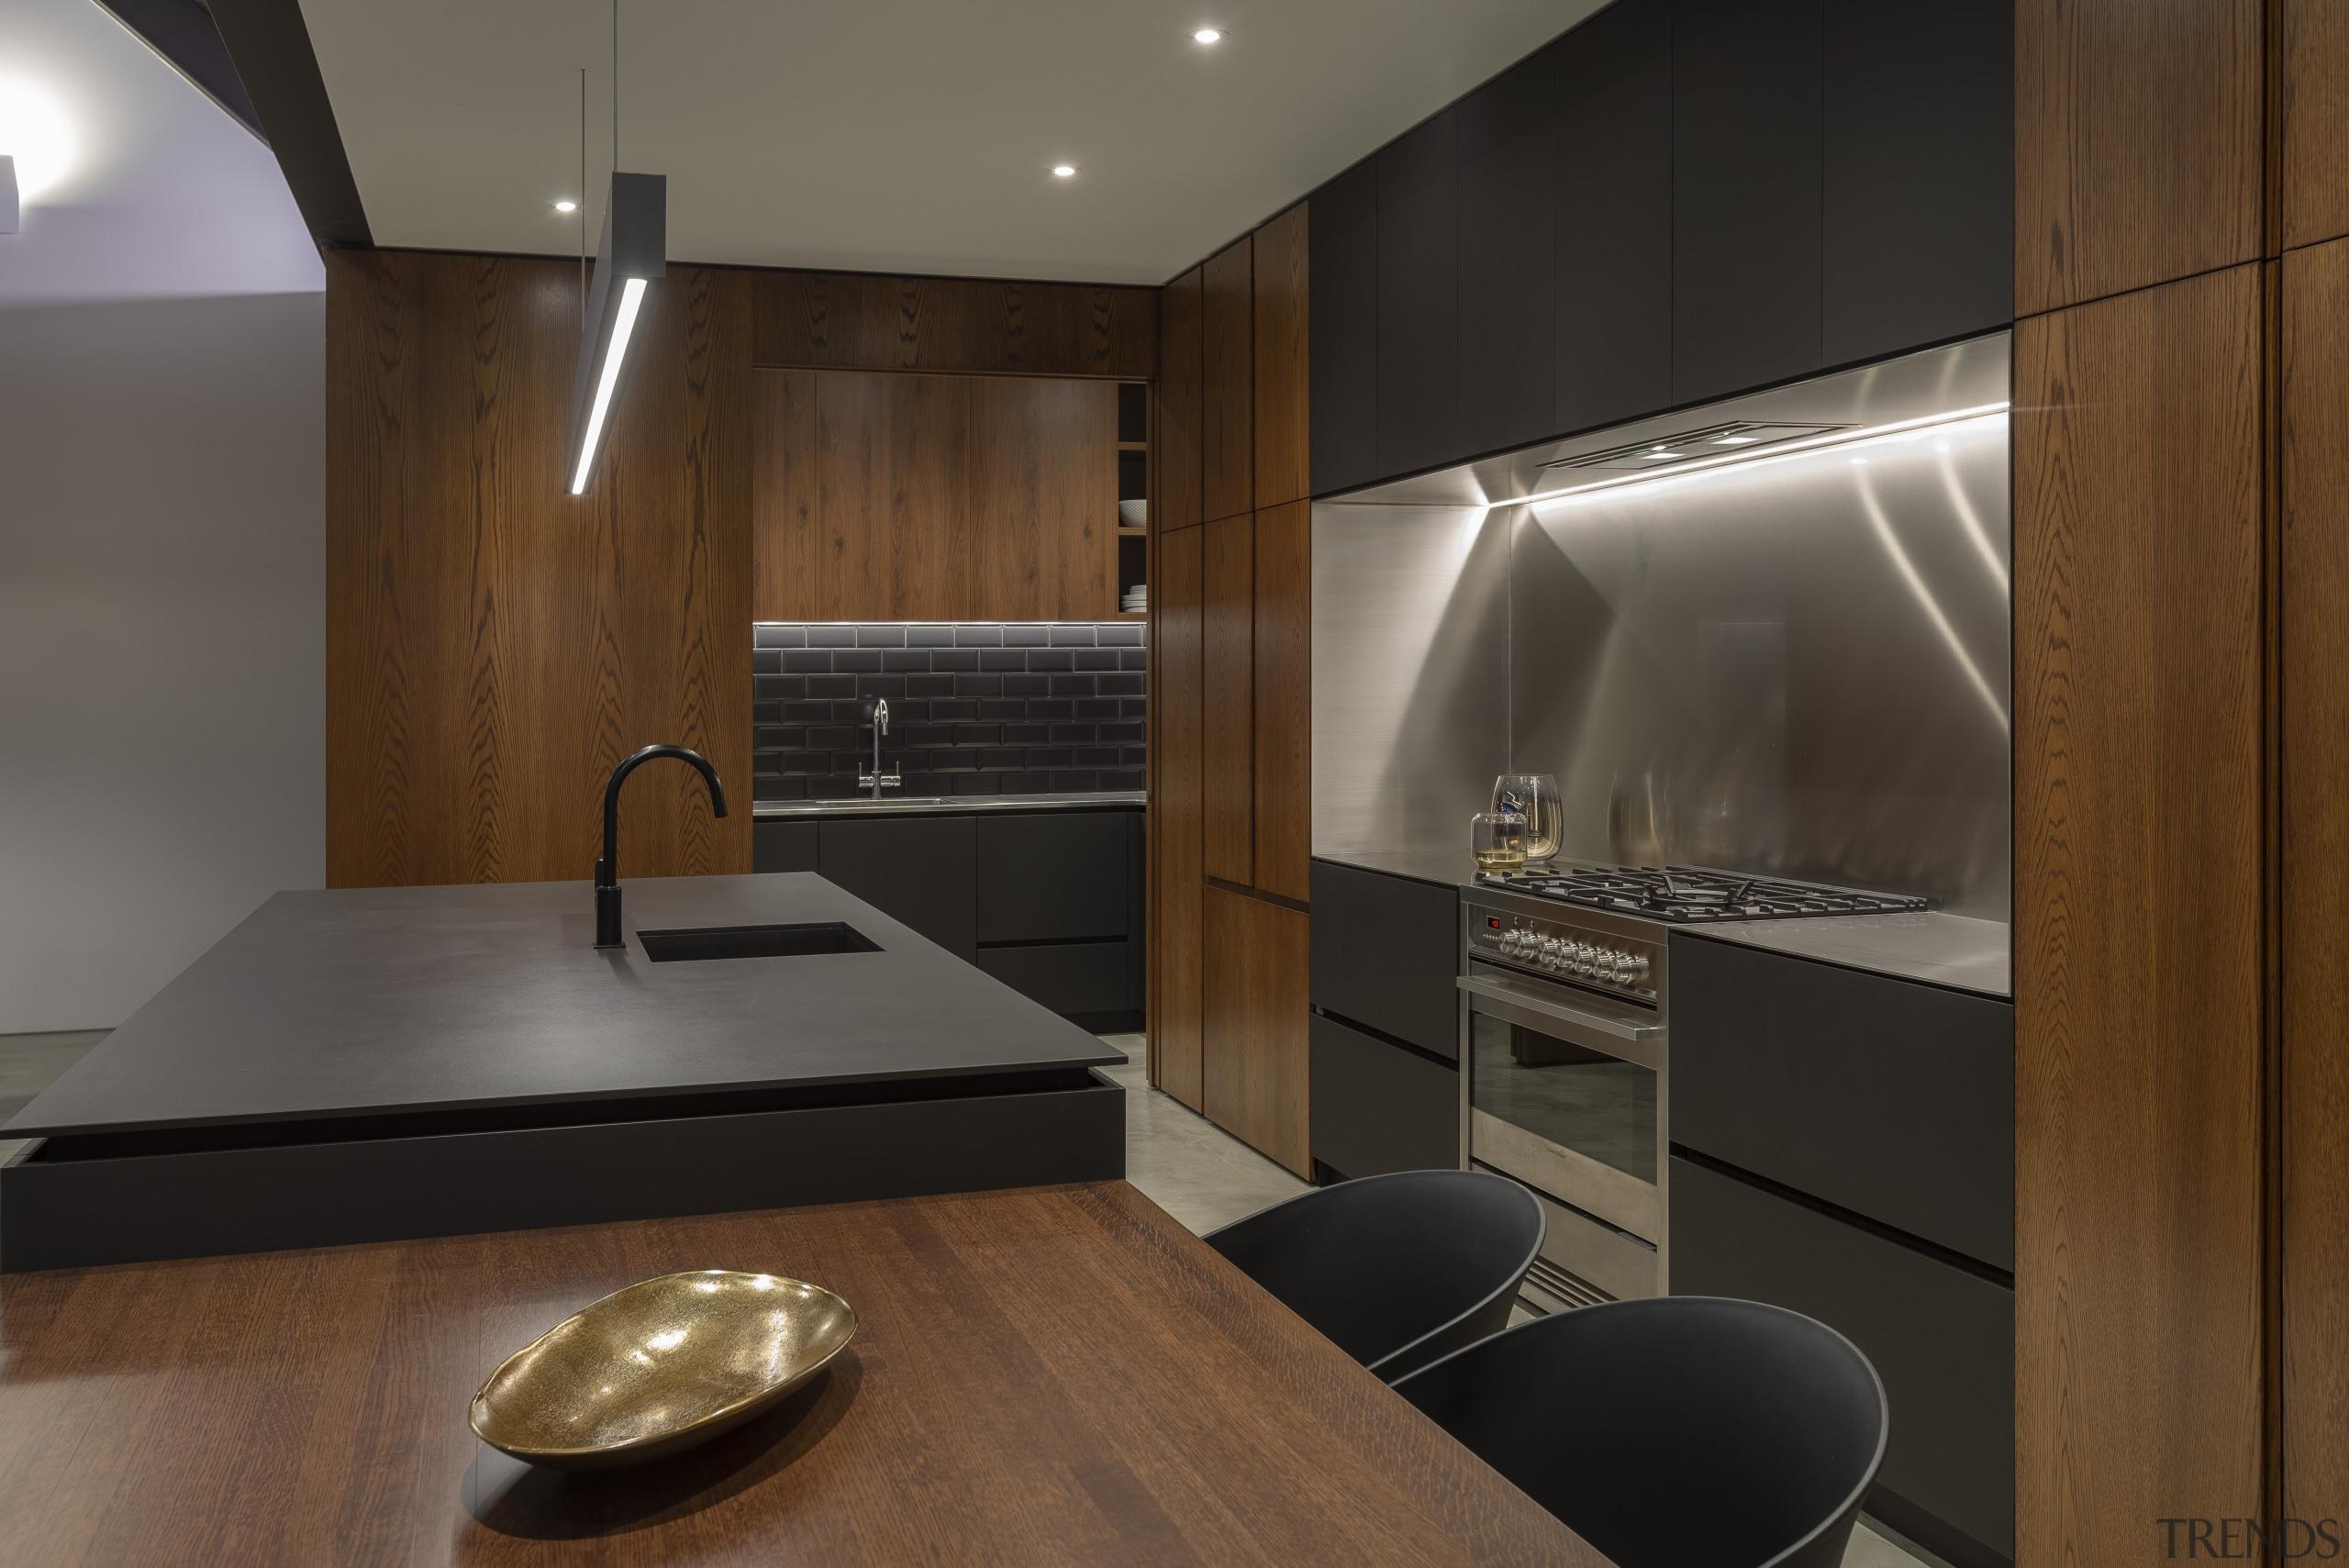 Creating a sense of symmetry was critical to architecture, cabinetry, countertop, splashback, backsplash, stainless steel, interior design, kitchen, Cube Dentro, Dekton domos